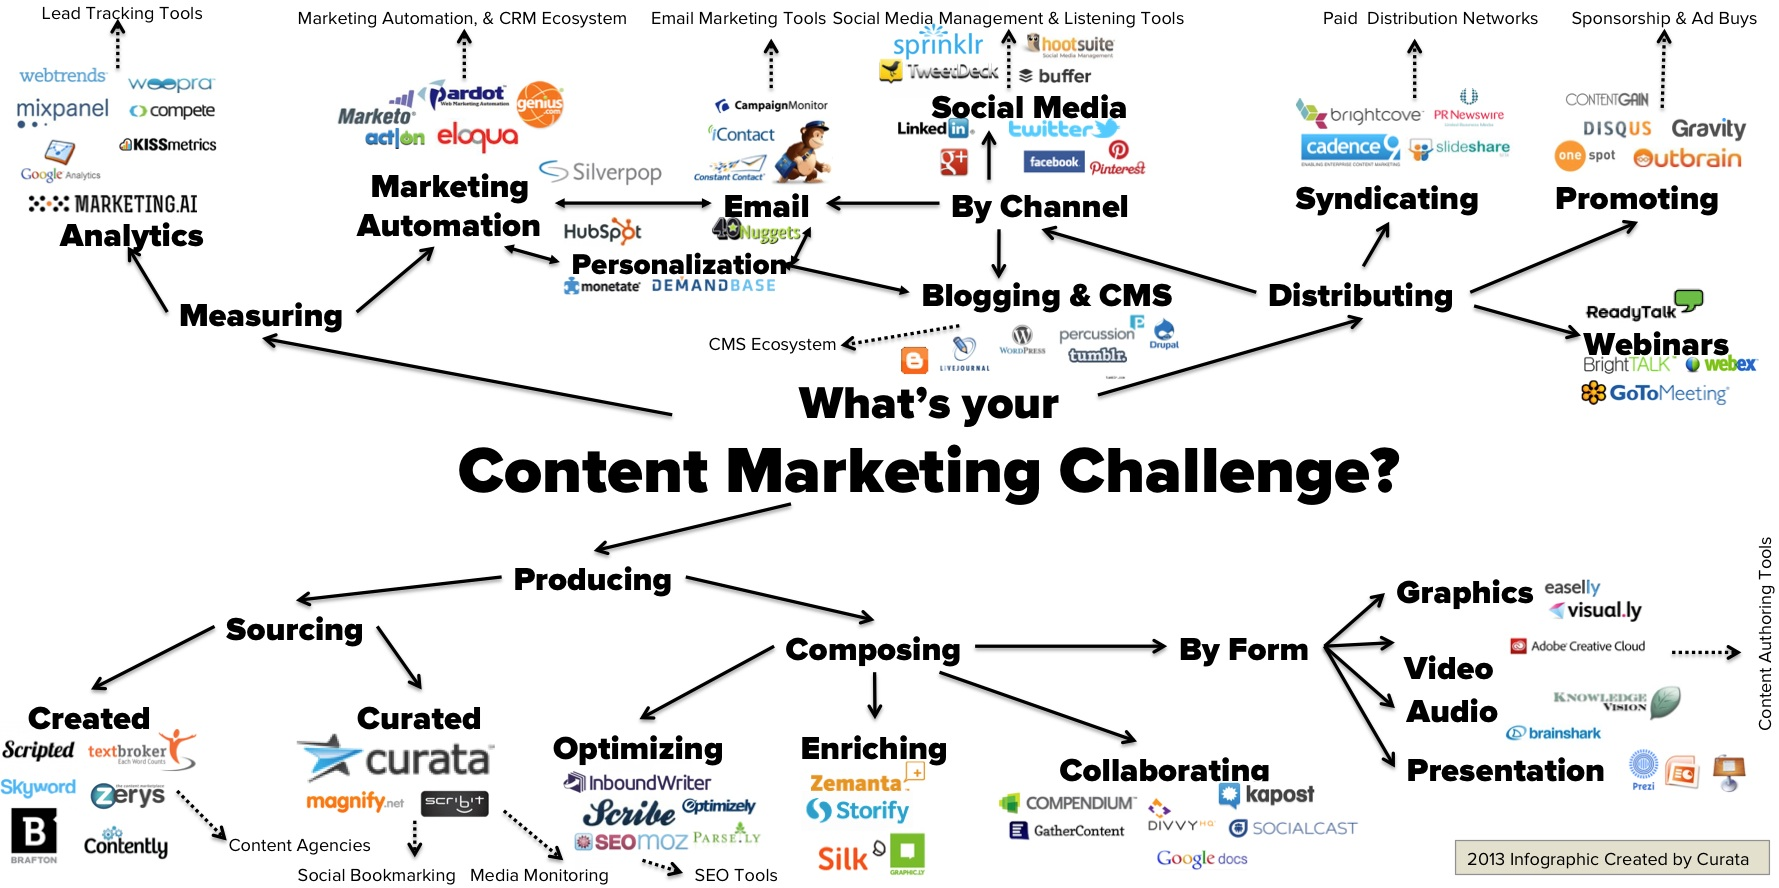 Startup Tools Joel Zhuoer Wangs Blog Docircuits Circuit Simulator Online Schematic Editor Content Marketing Suites